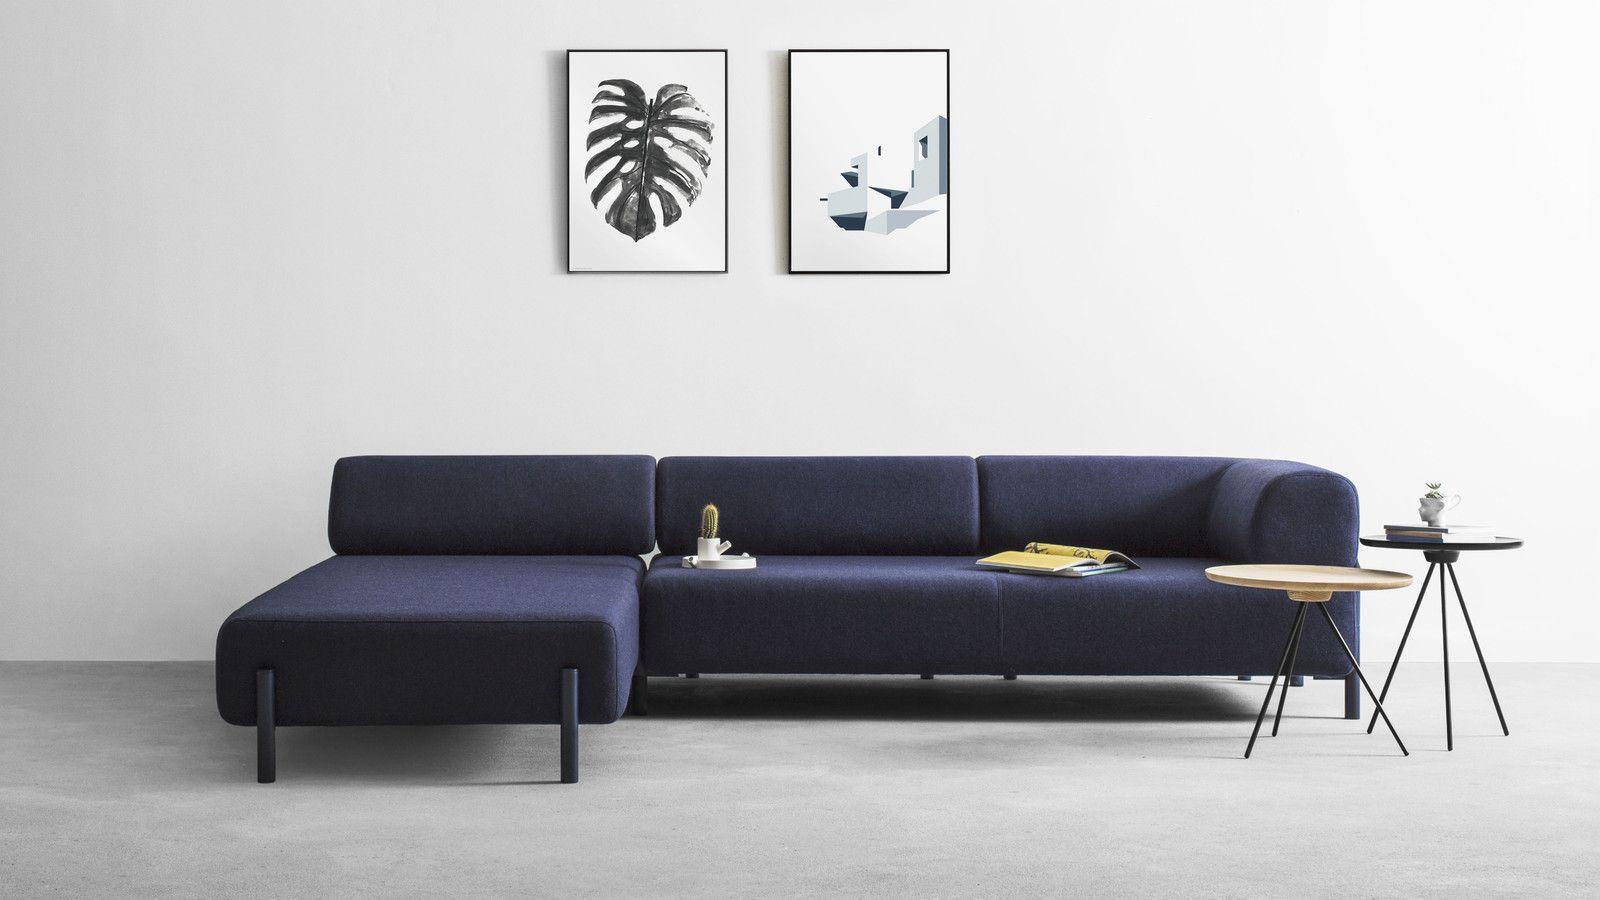 Wonderful Palo Corner Sofa Right U2013 Modern Section Sofas, Minimal Design   Hem.com Idea